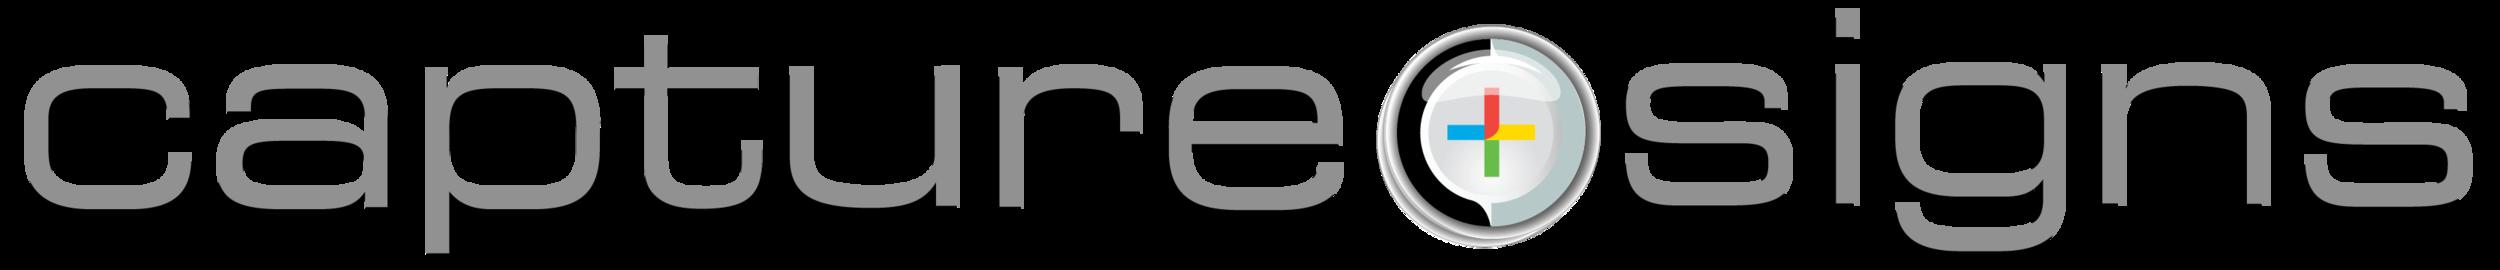 logo-capturesigns-01.png